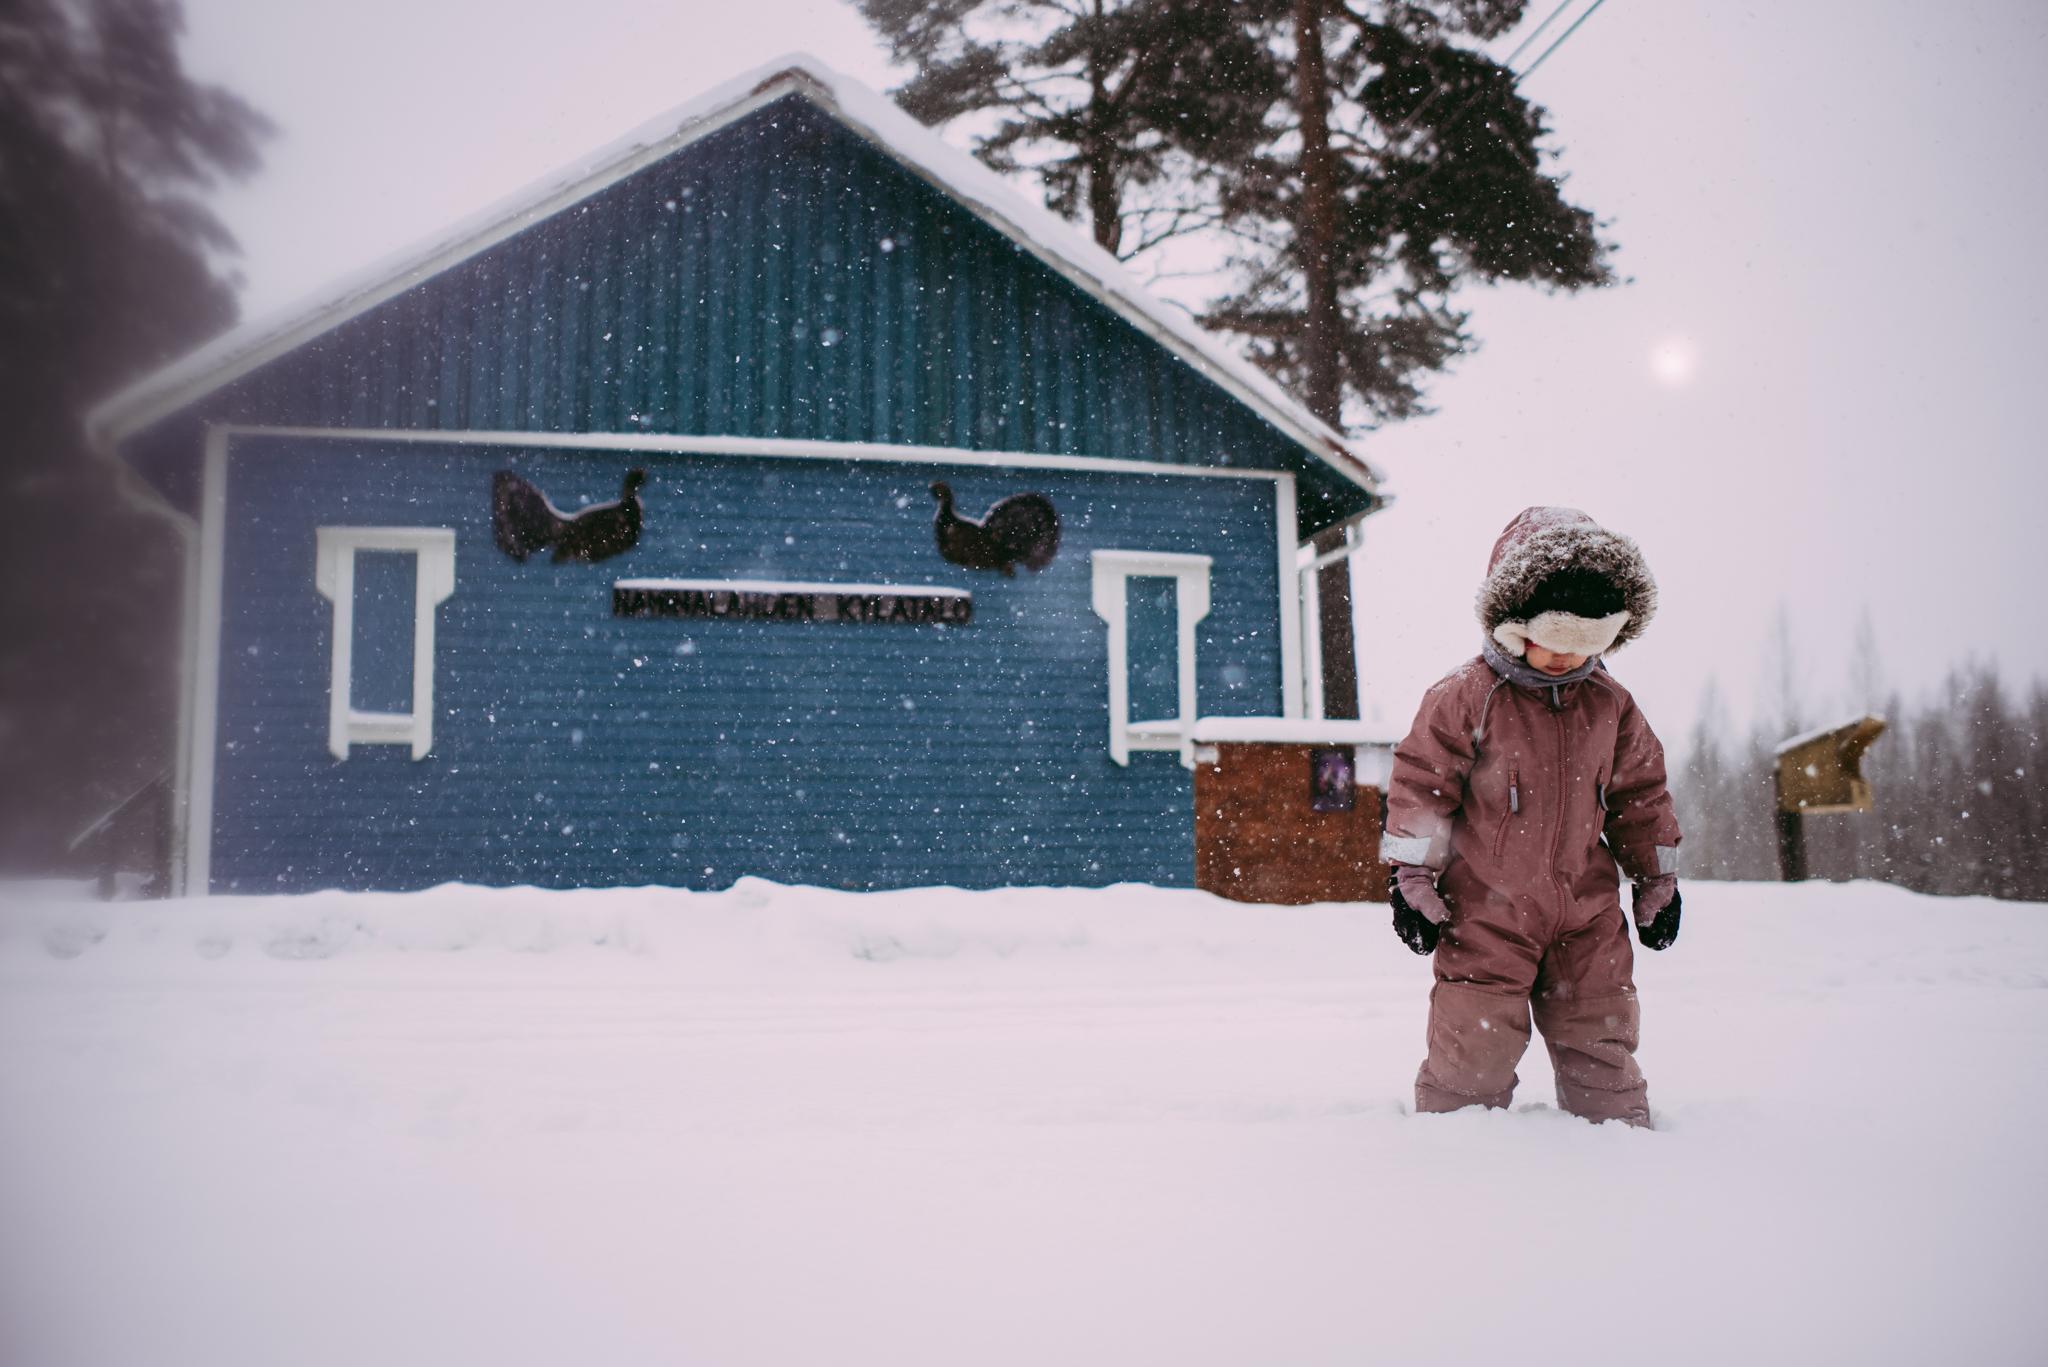 2017-02-23-blue house-31_LR edited_web.jpg